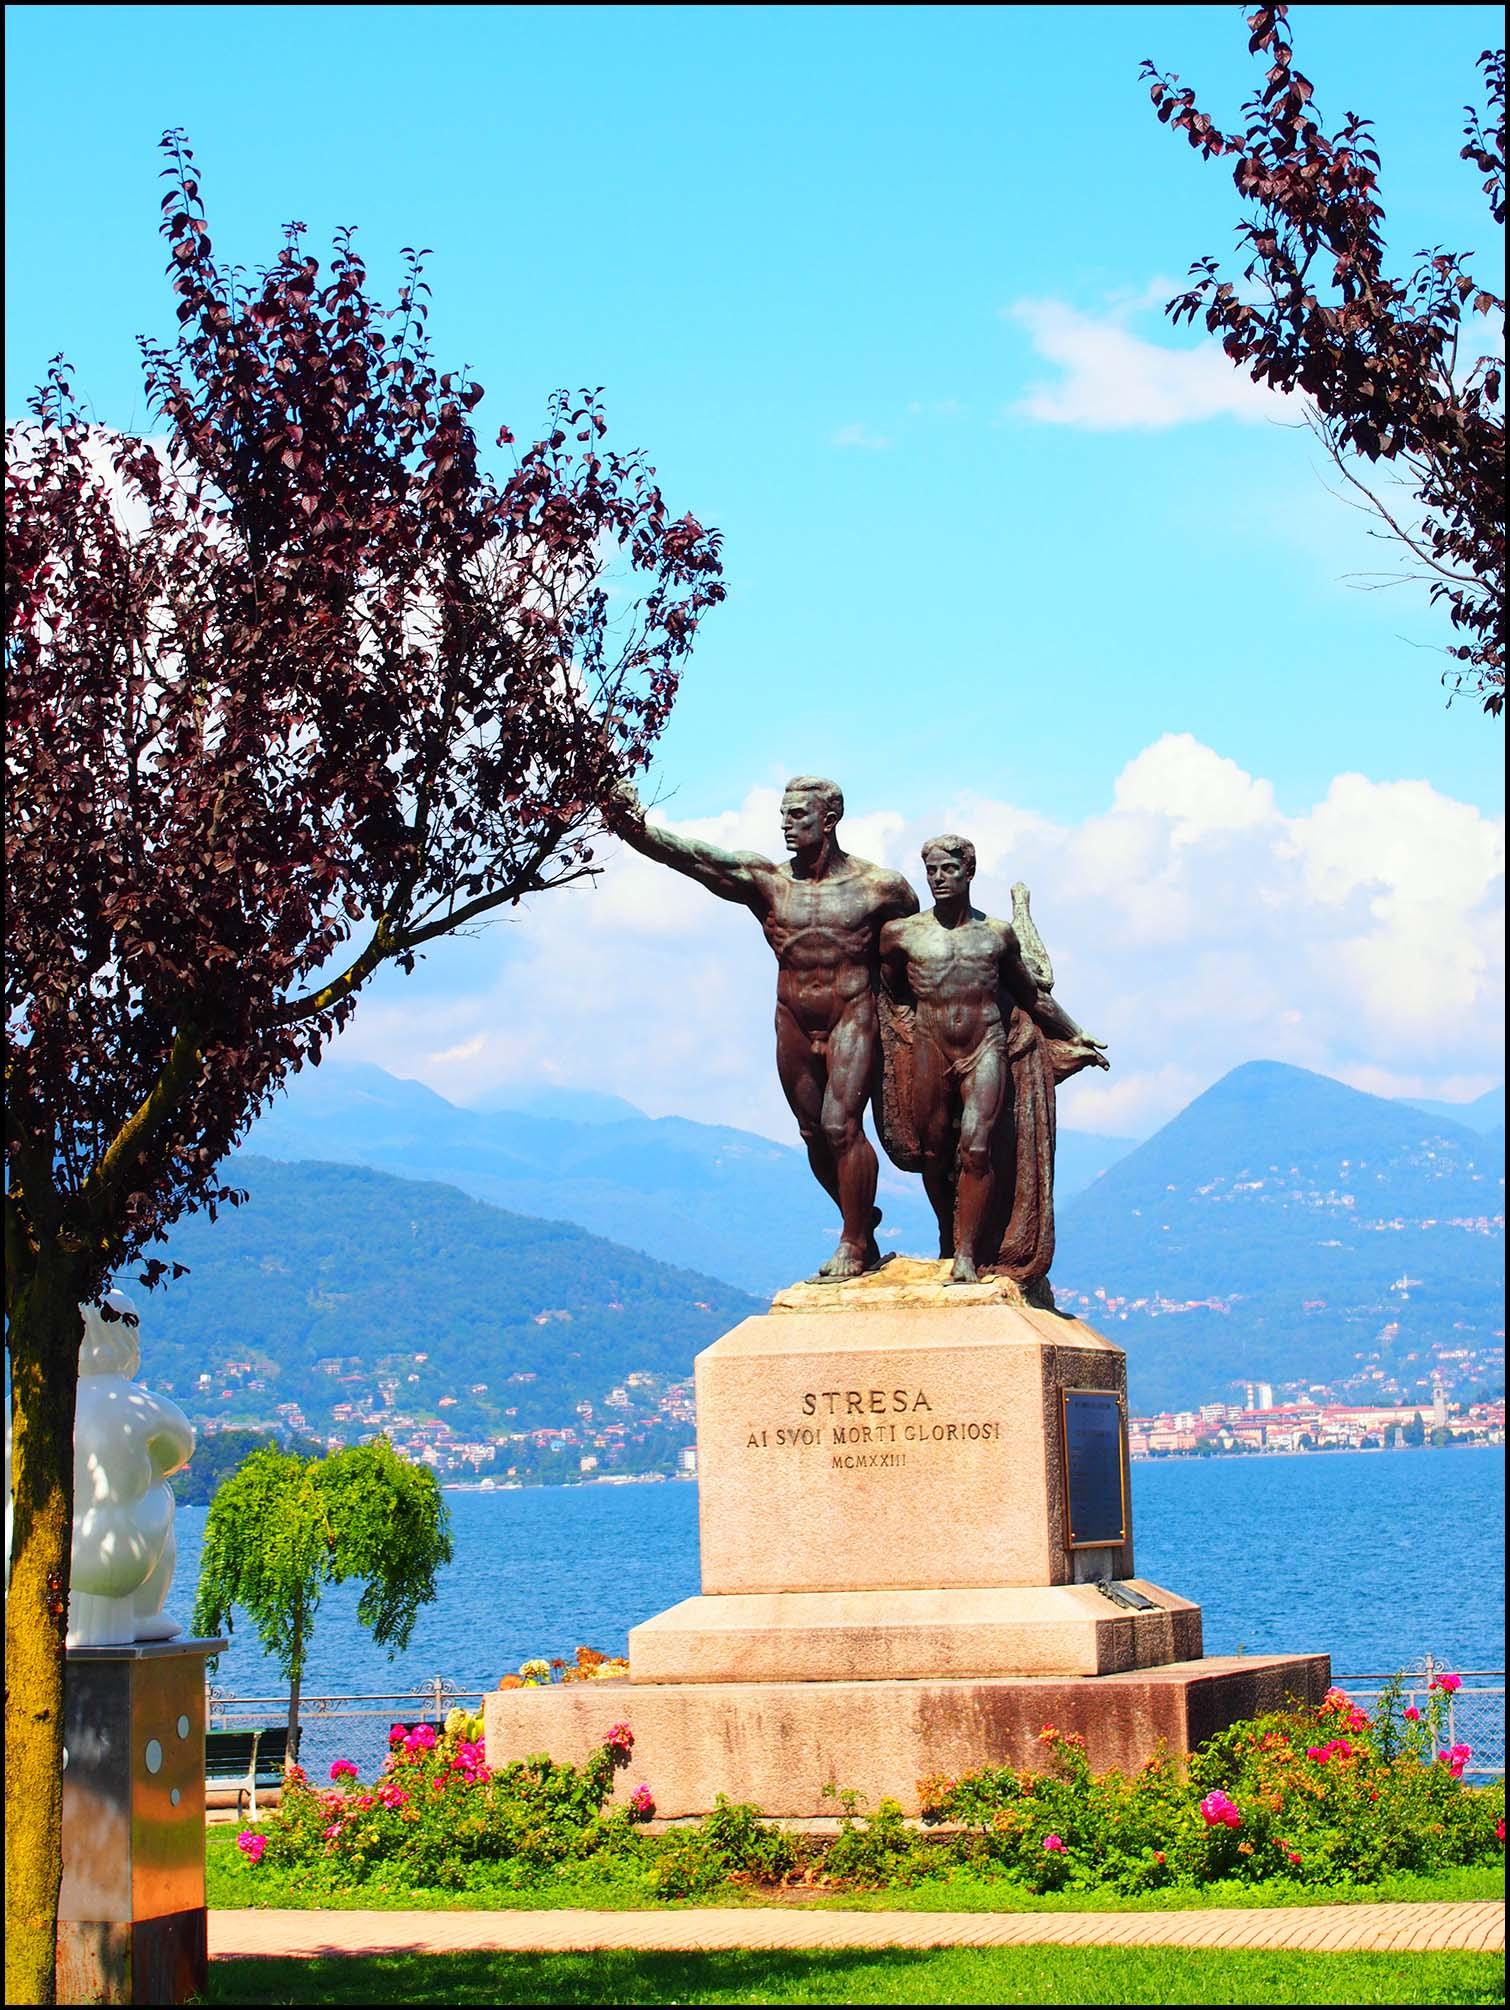 Statue, Stresa